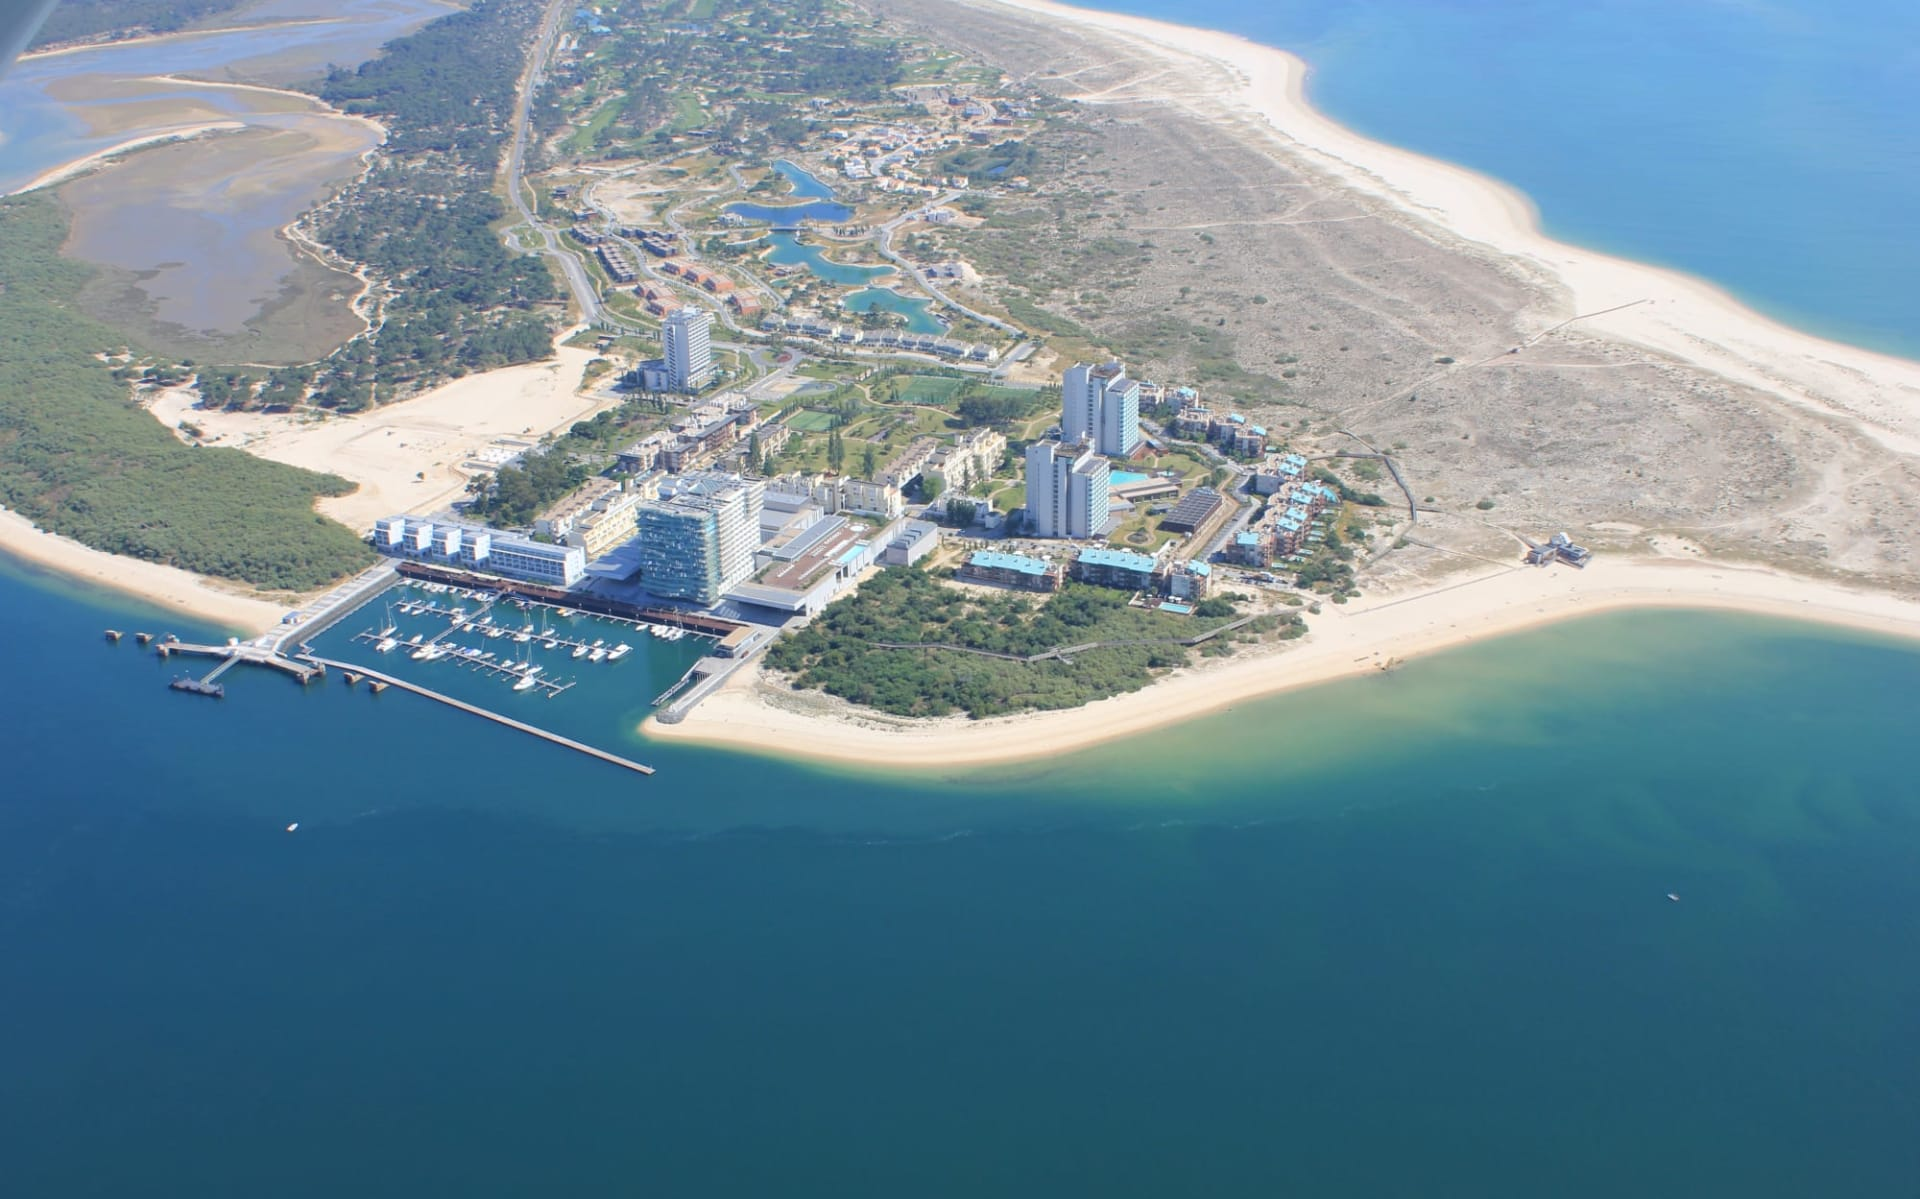 Troia Golf Resort in Lissabon: Troiaresort